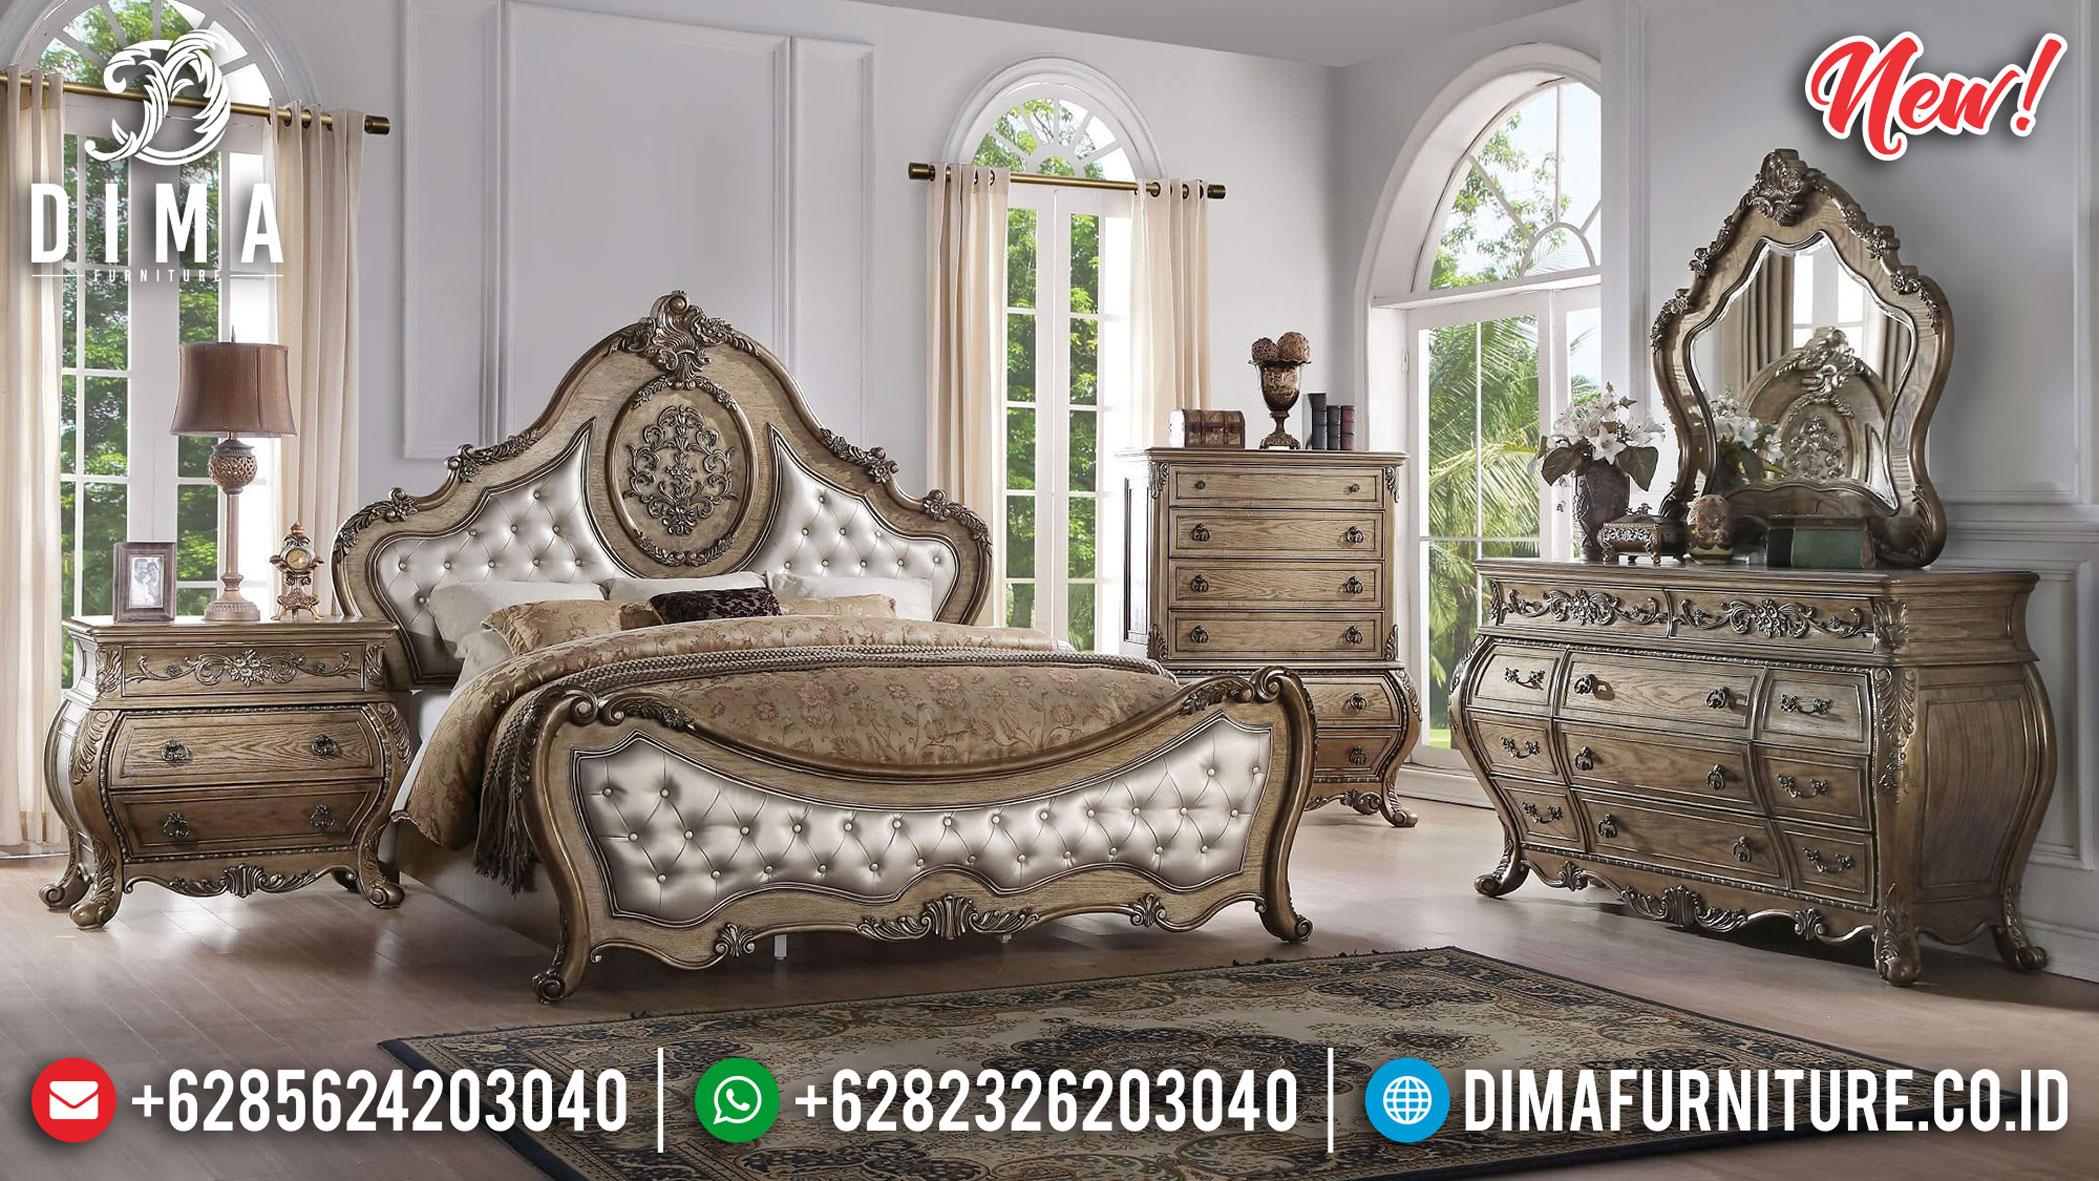 Jual Kamar Set Ukiran Mewah Luxury Classic Jepara New 2020 Design TTJ-1082